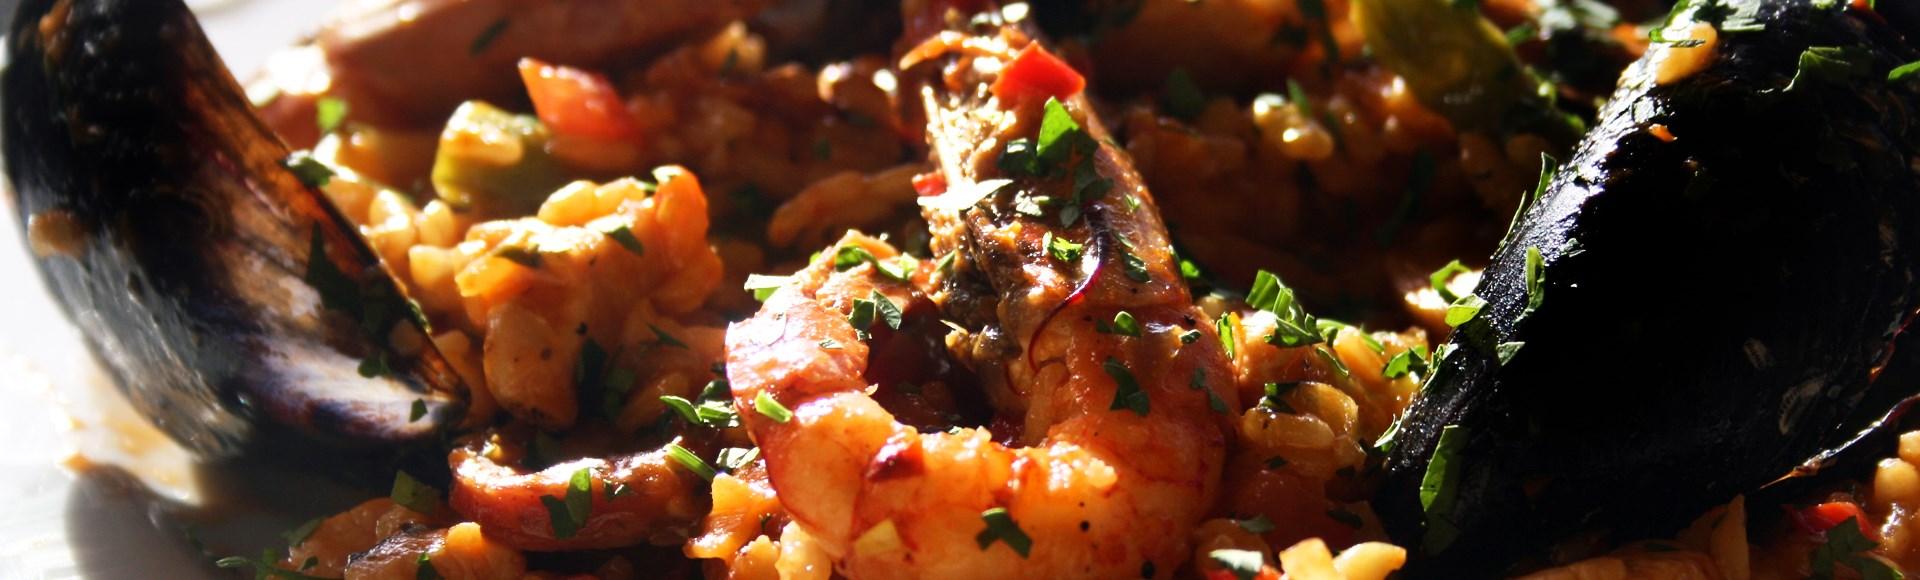 antonis-stavros-chania-crete-greece-13 - Chef Antonis & Stavros - Chania, Kreta, Hellas - Alargo | Håndplukkede ferieboliger på Kreta, Korfu og Paros